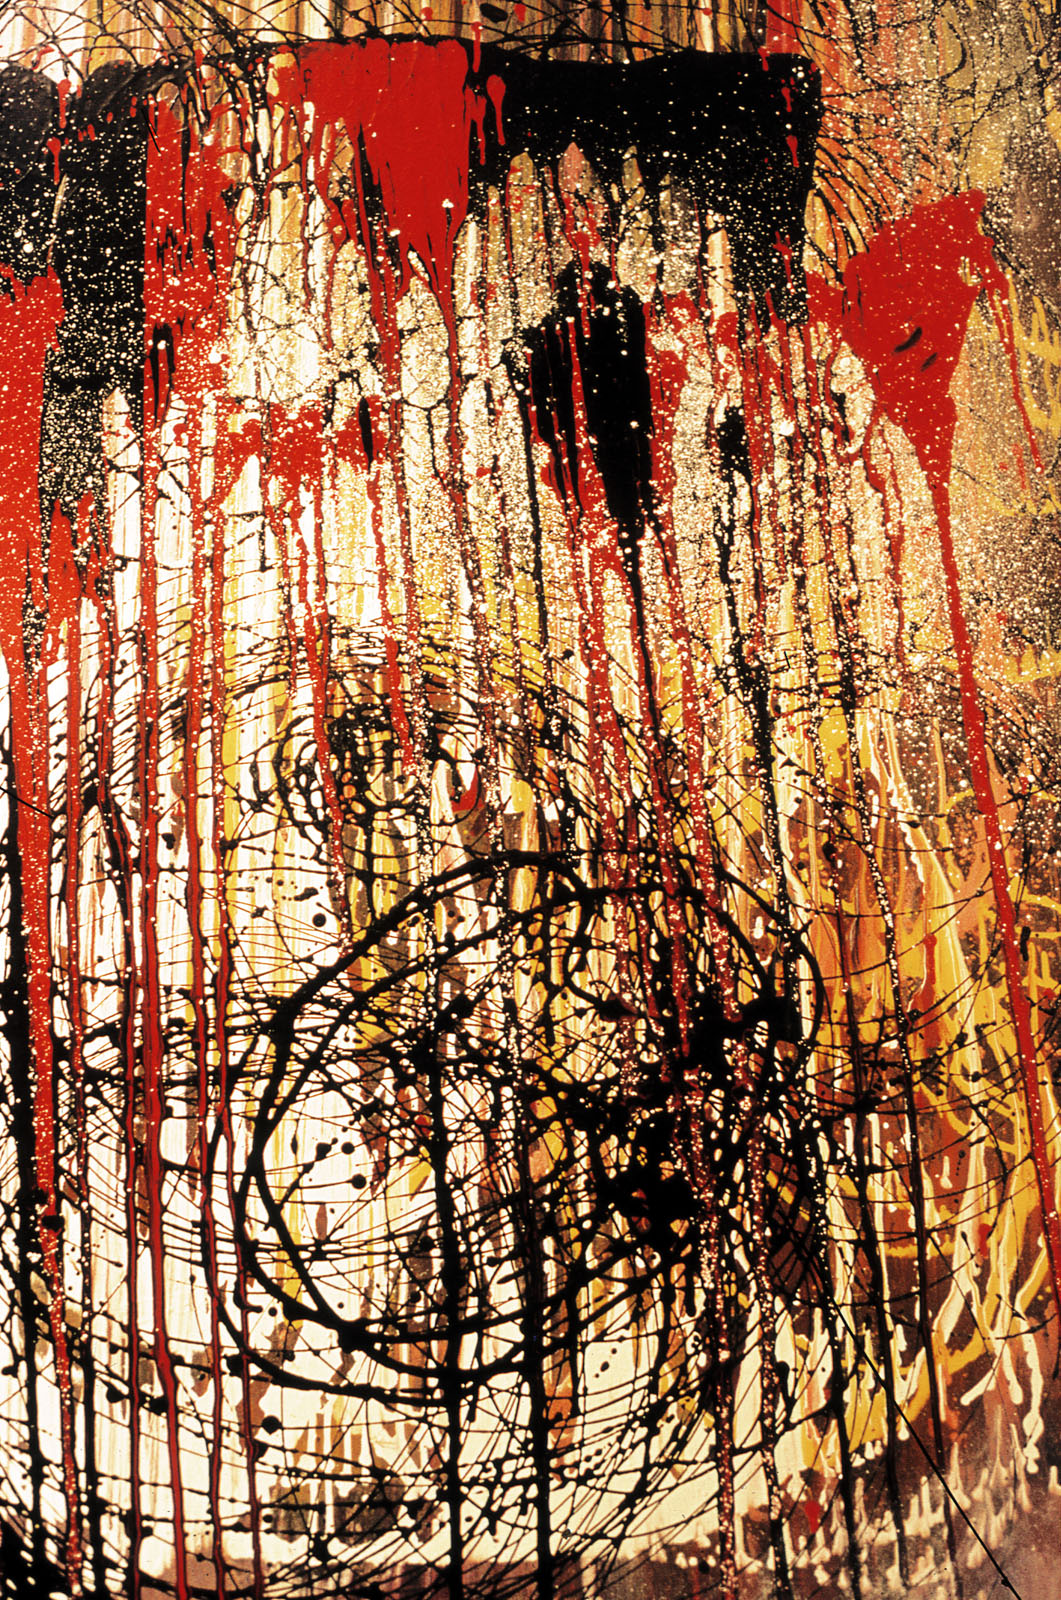 panies-danielvillalobos-spanish-painting-abstractexpressionism-13